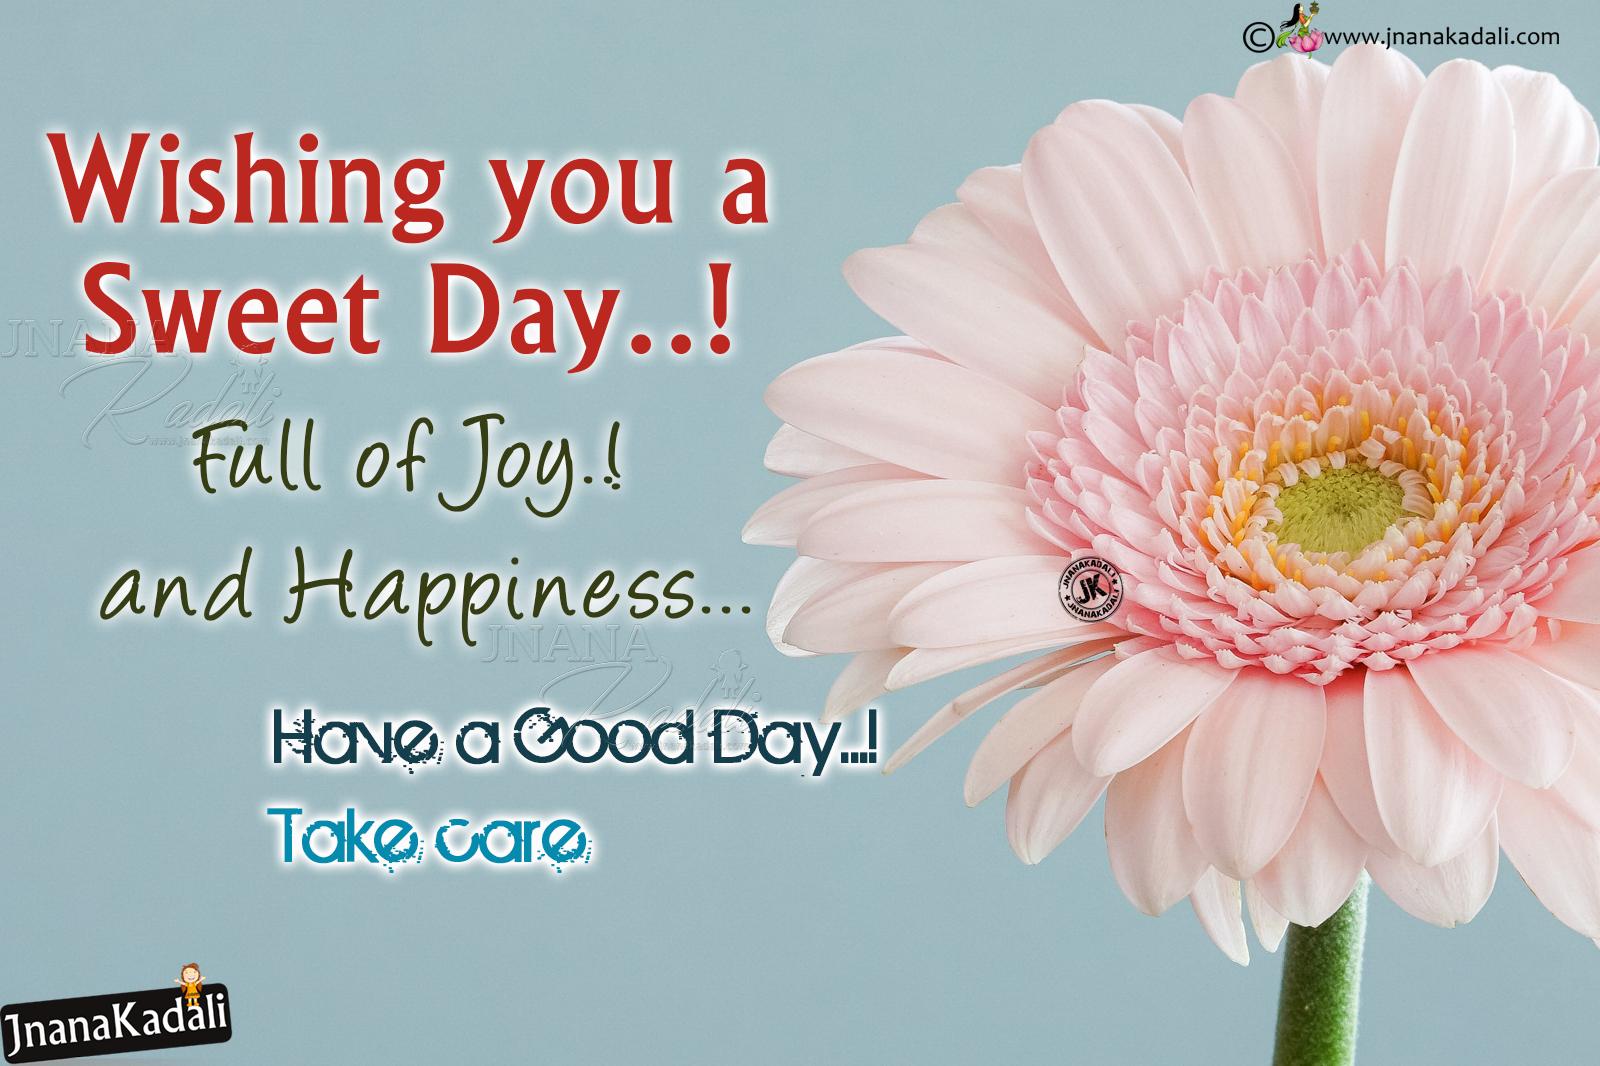 Wishing You A Sweet Day Quotes Greetings In English Jnana Kadali